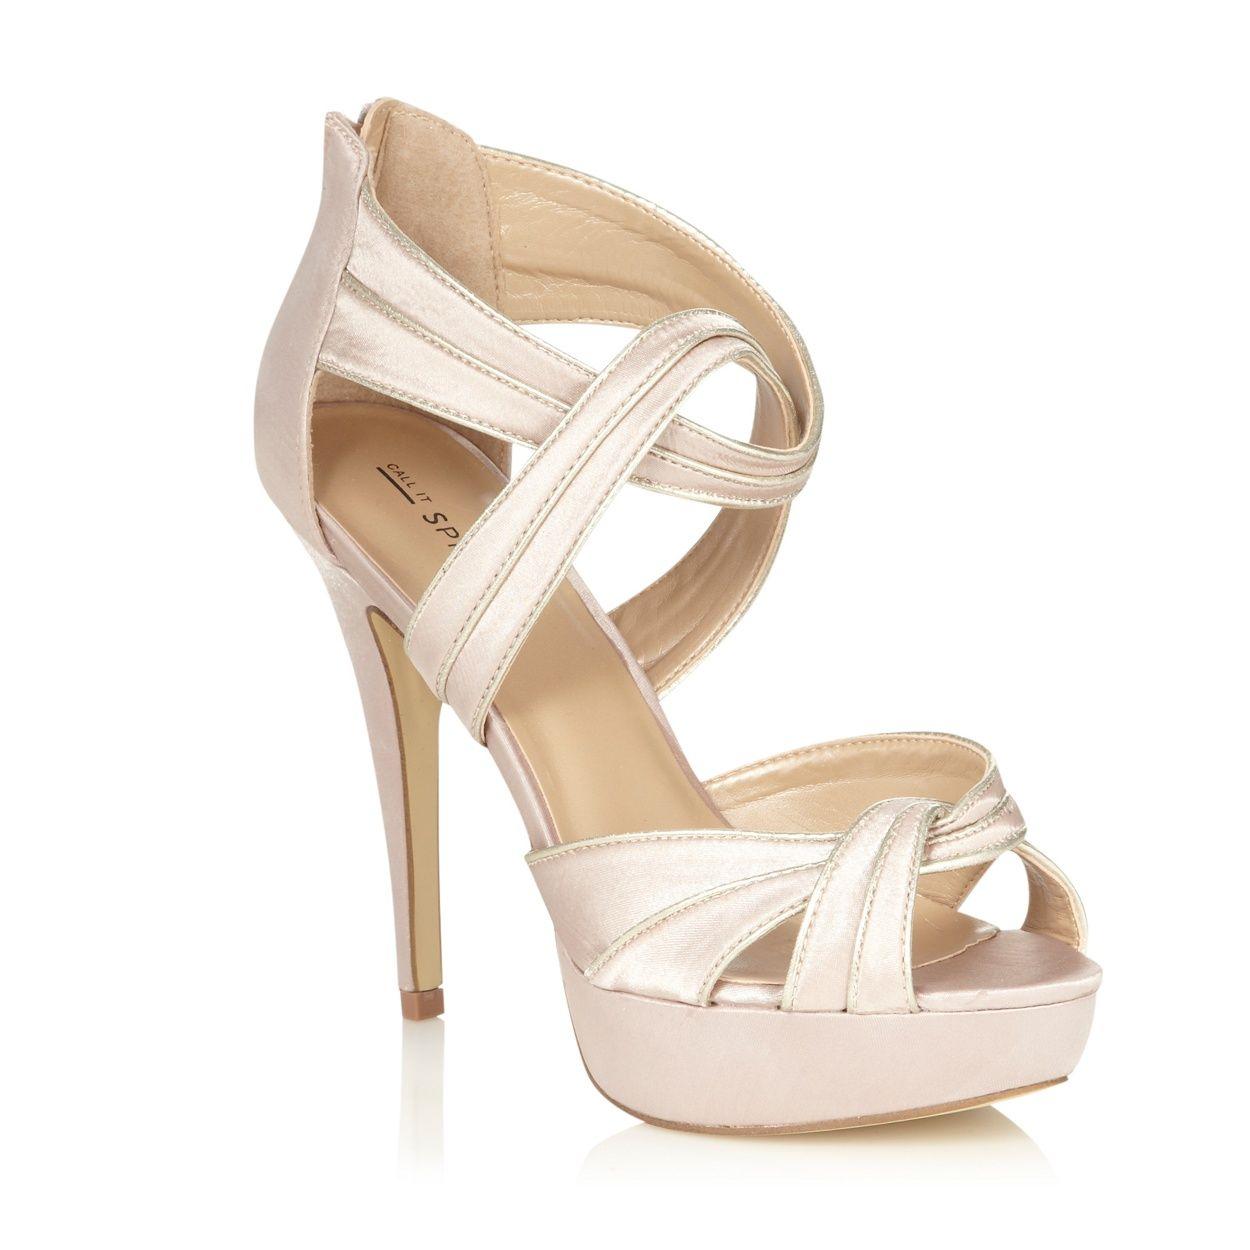 Women's sandals debenhams - Call It Spring Light Pink Textured Strapped High Heeled Sandals At Debenhams Com